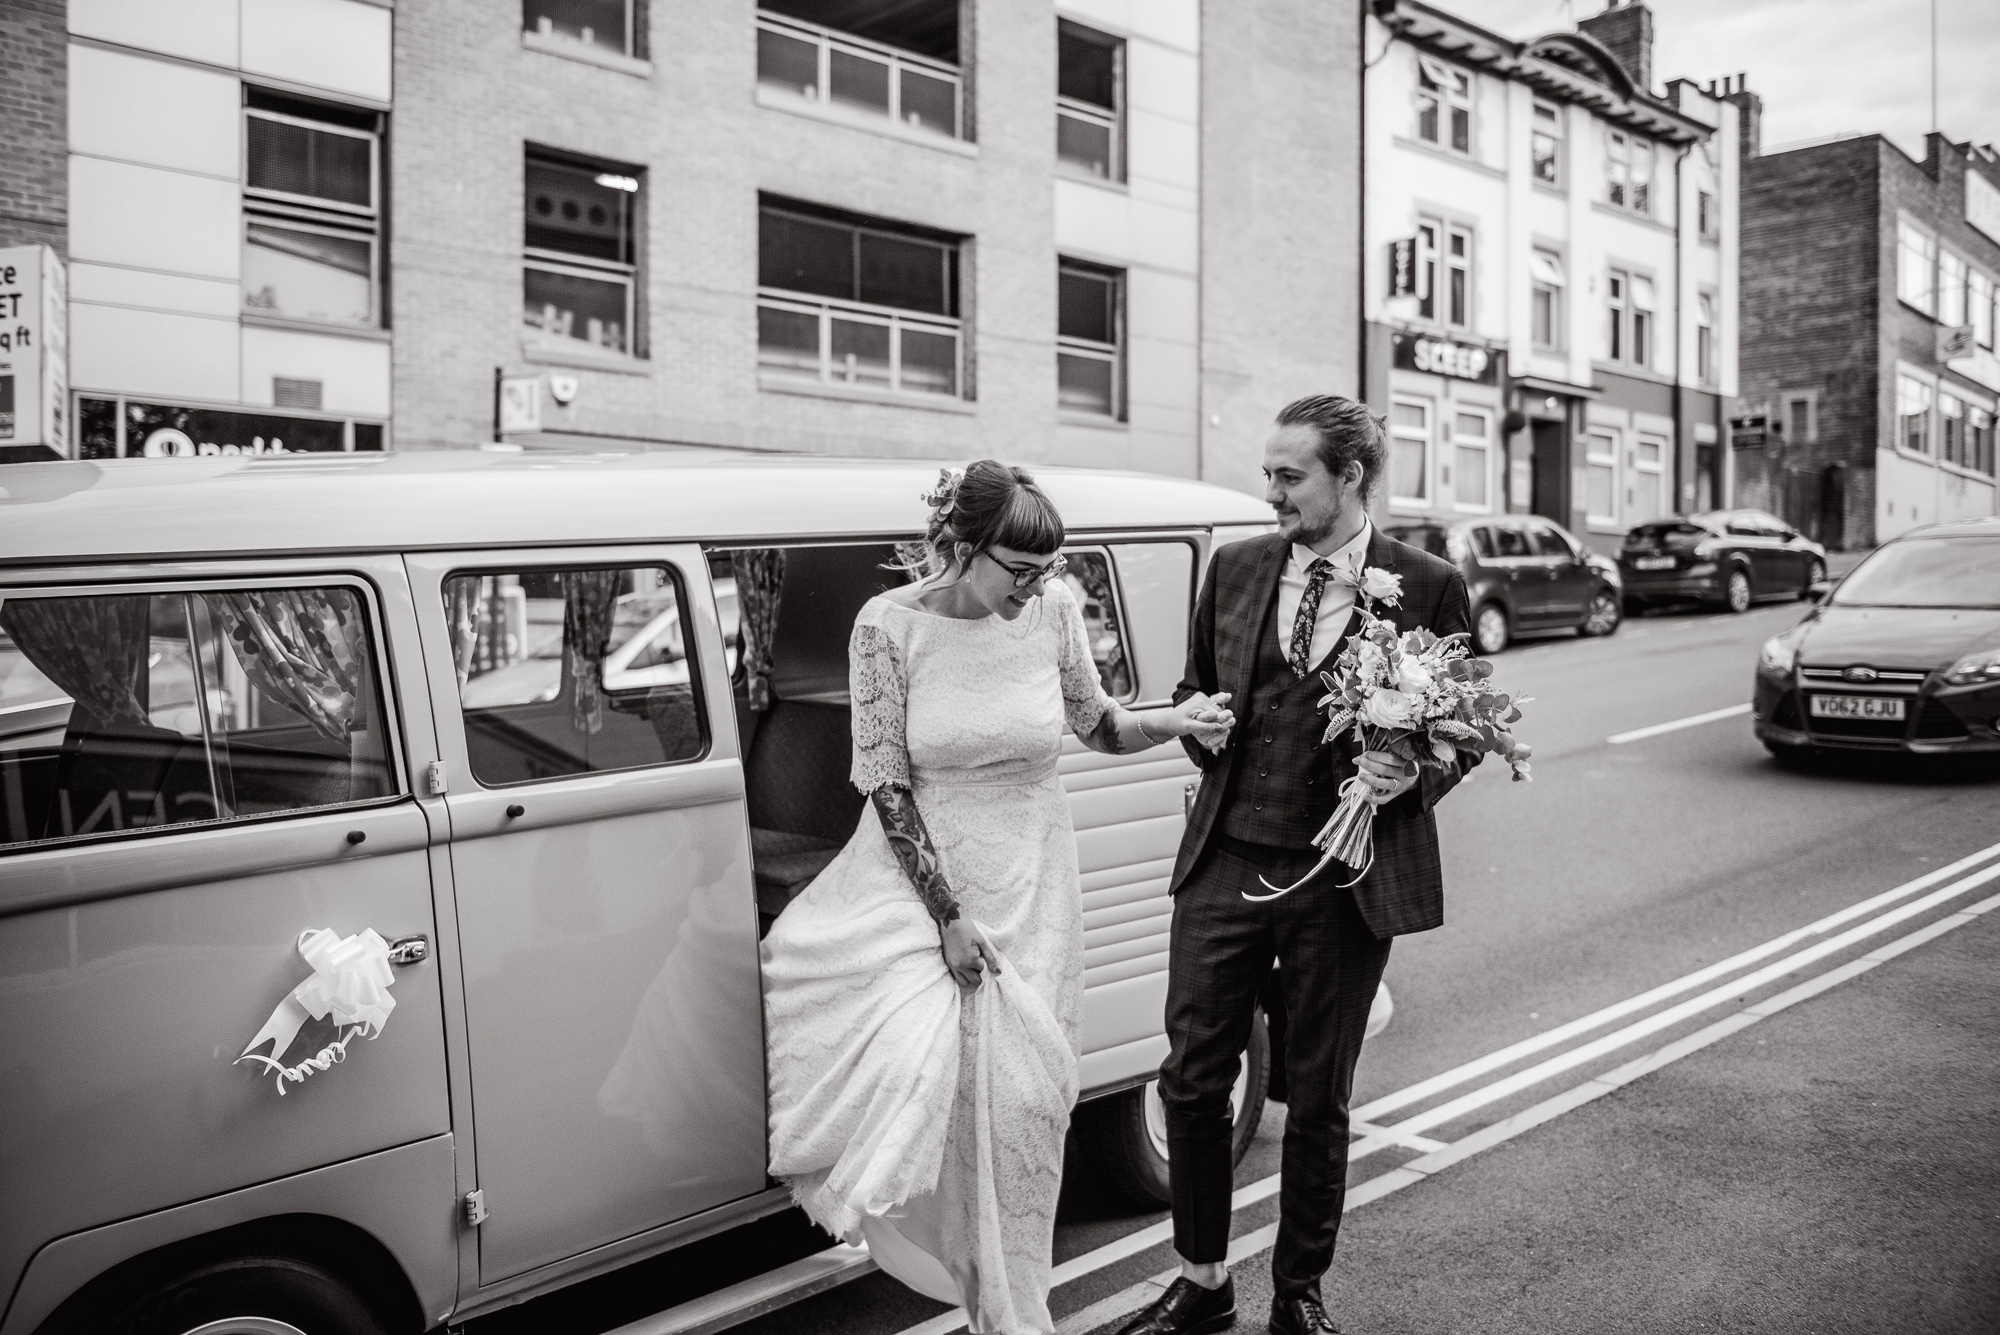 Harriet-Dahlia-Bespoke-Lace-Silk-Bohemian-Wedding-Dress-Sleeves-Tattooed-Bride-Alternative-Wedding-Sheffield-22.jpg